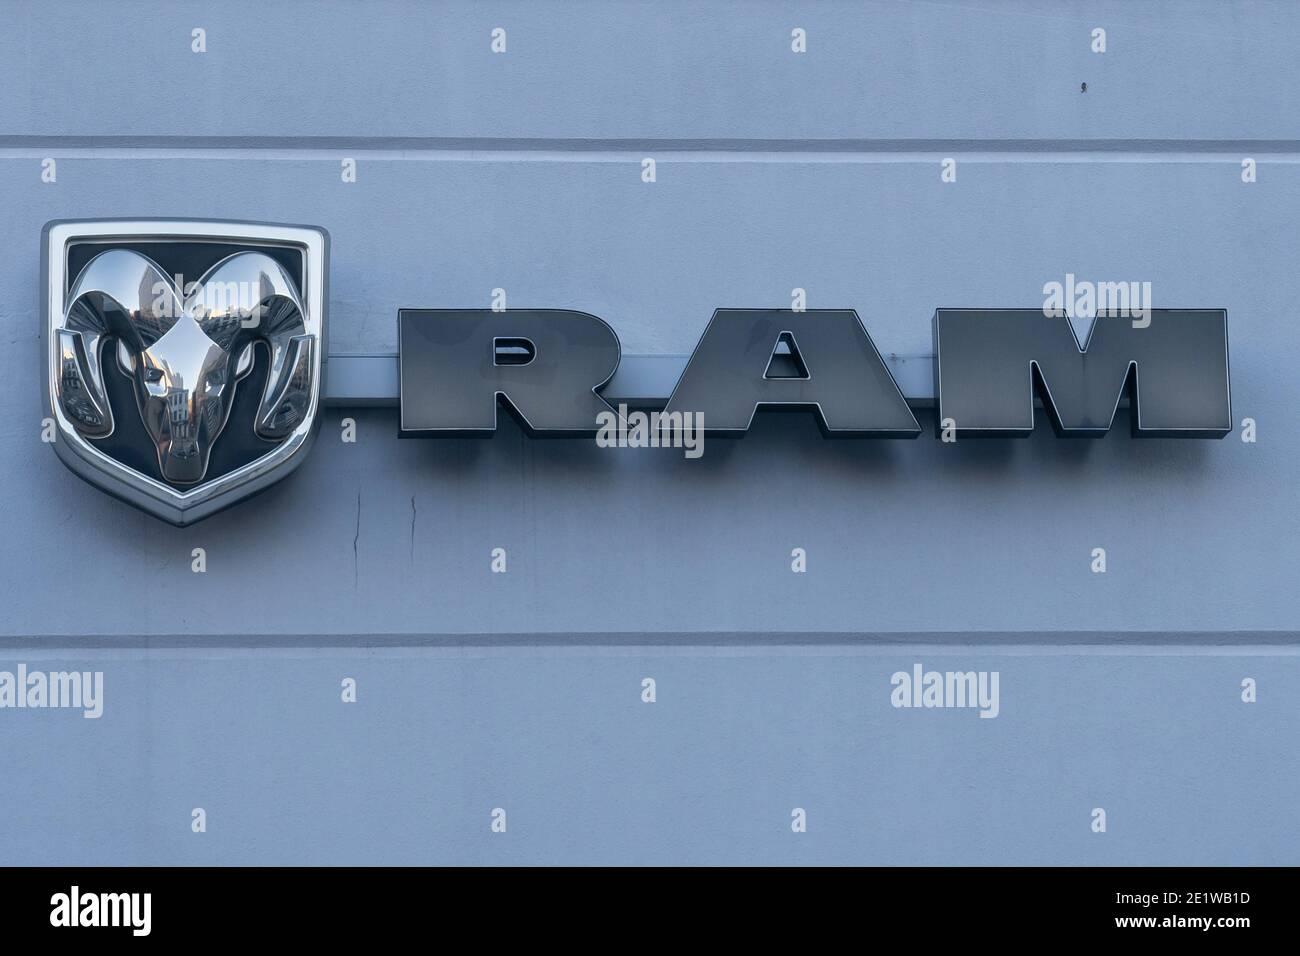 NEW YORK, NY – JANUARY 07, 2021: Ram logo seen at a dealership on Manhattan's Upper West Side. Stock Photo